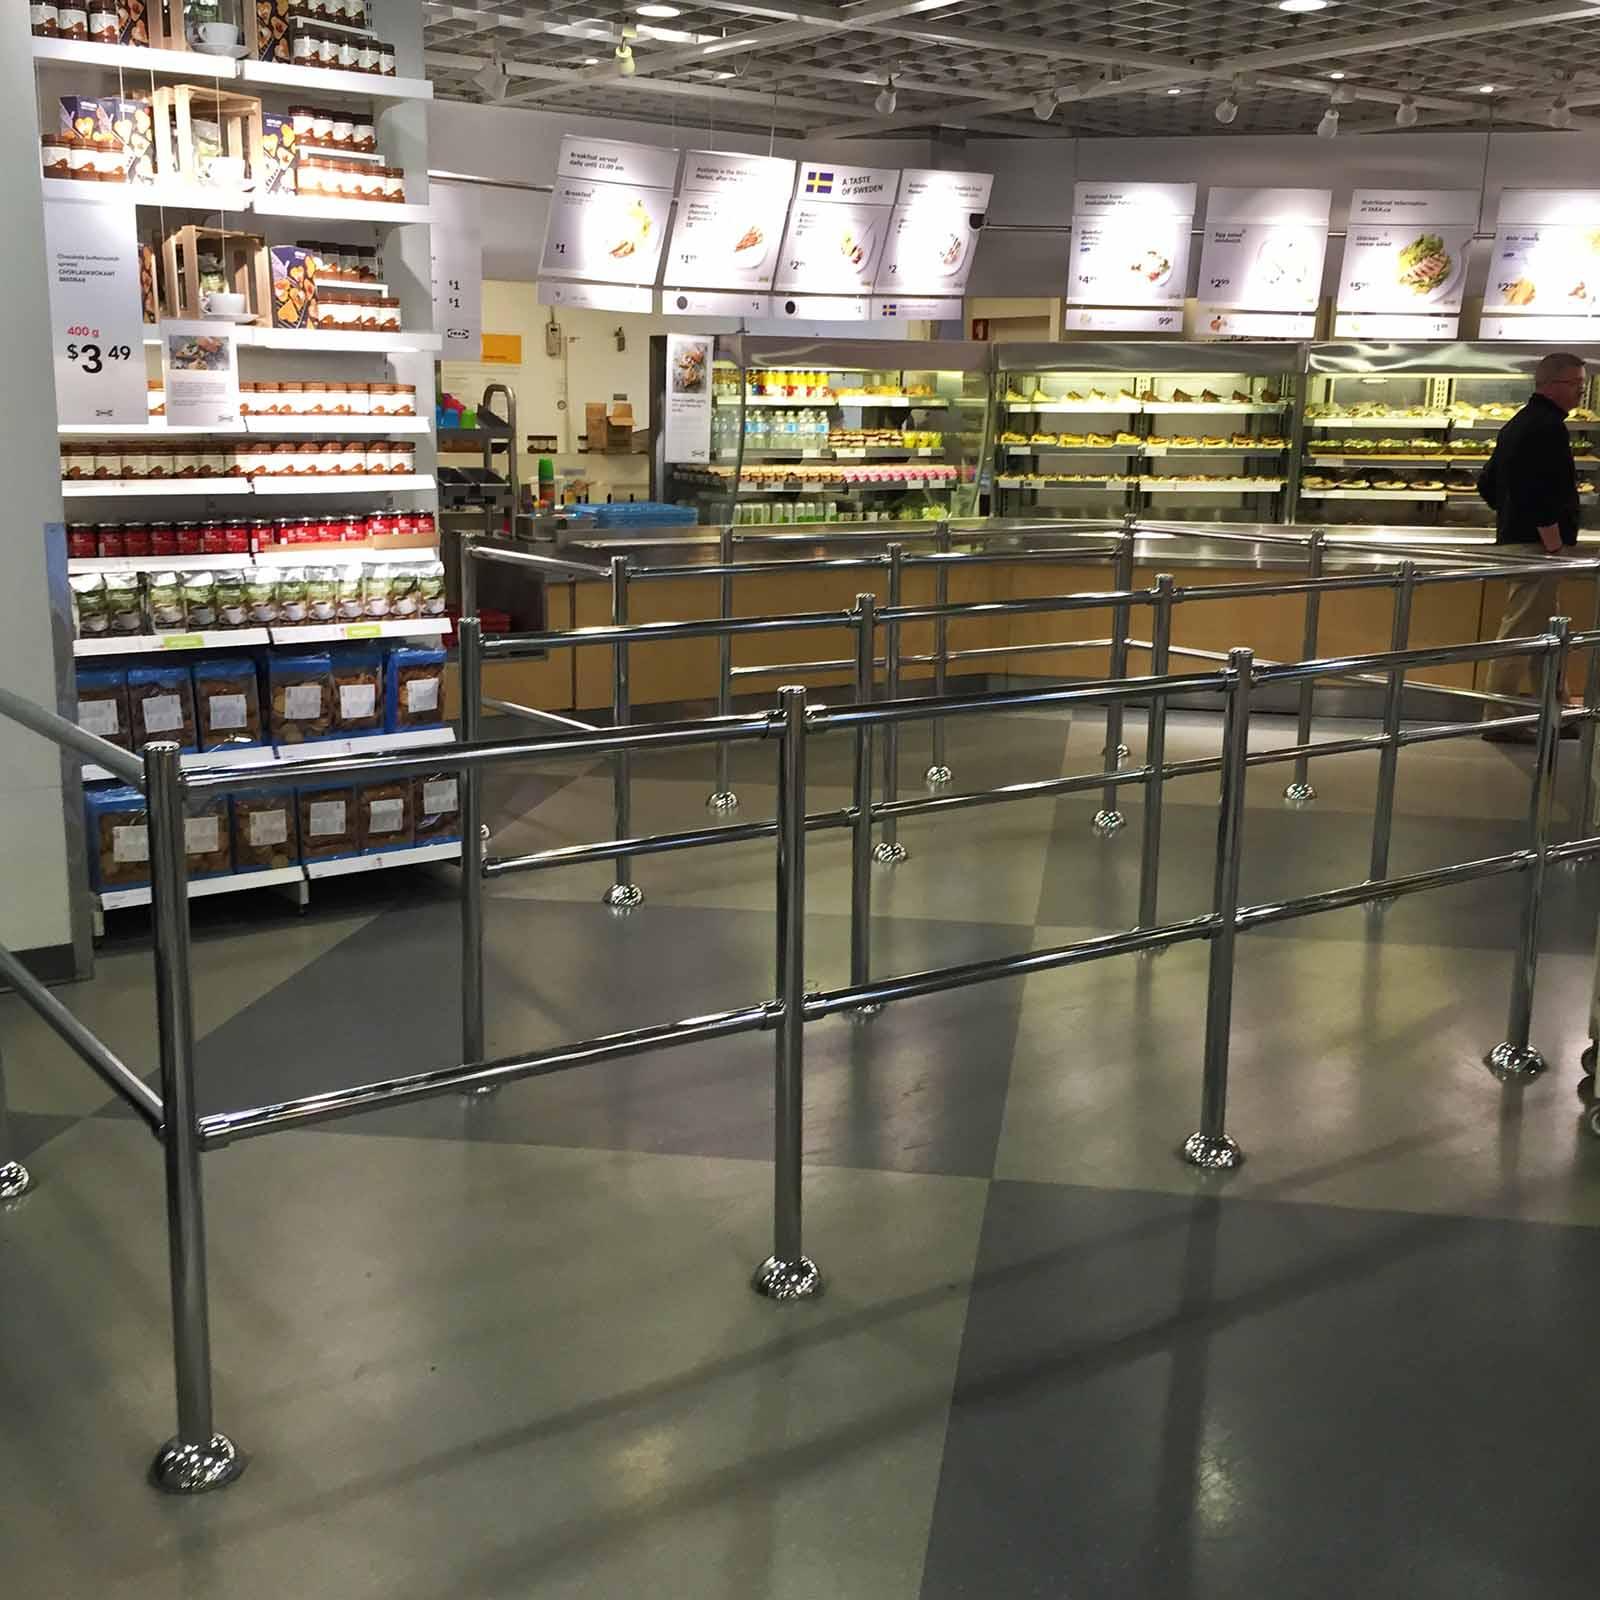 McCue Guidance Rail in Store